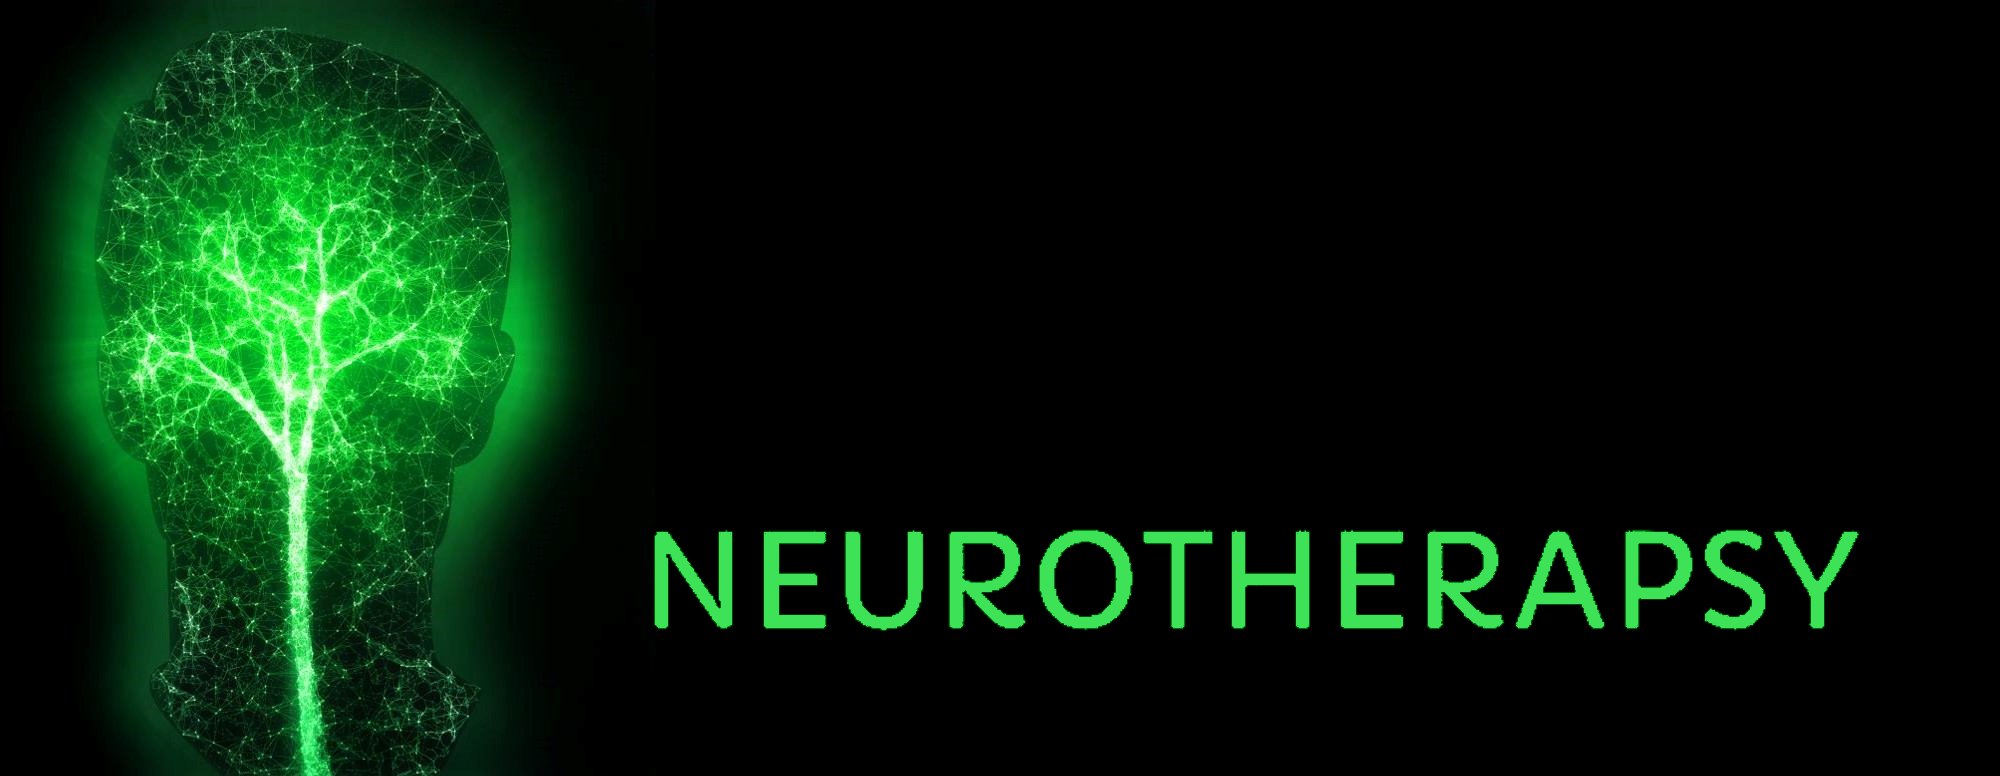 Neurotherapsy